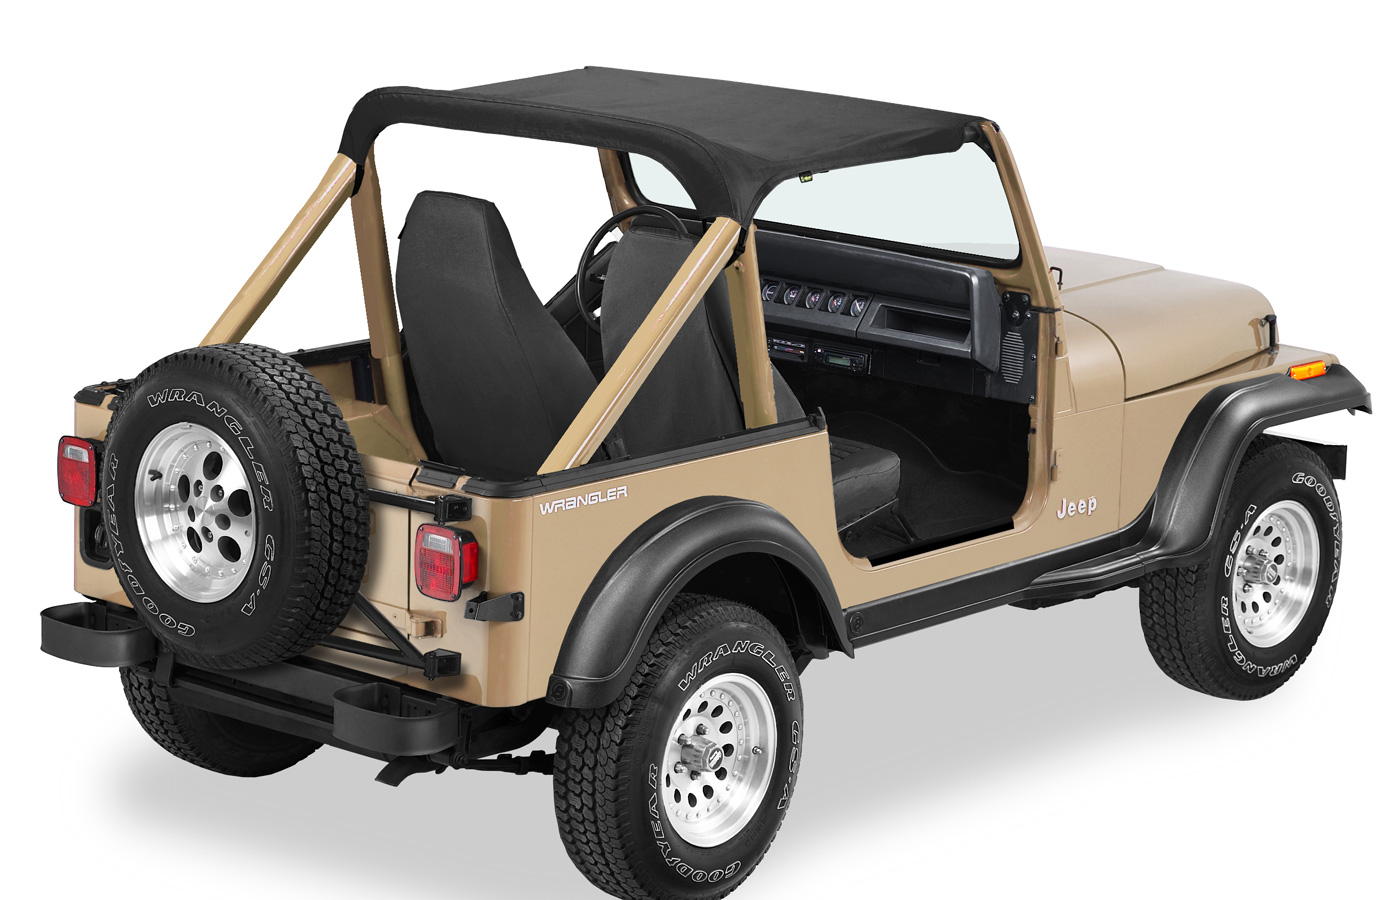 Bikini Top Jeep >> 1988-1994 Suzuki Sidekick Bestop Strapless Bikini Top - Bestop 52570-15